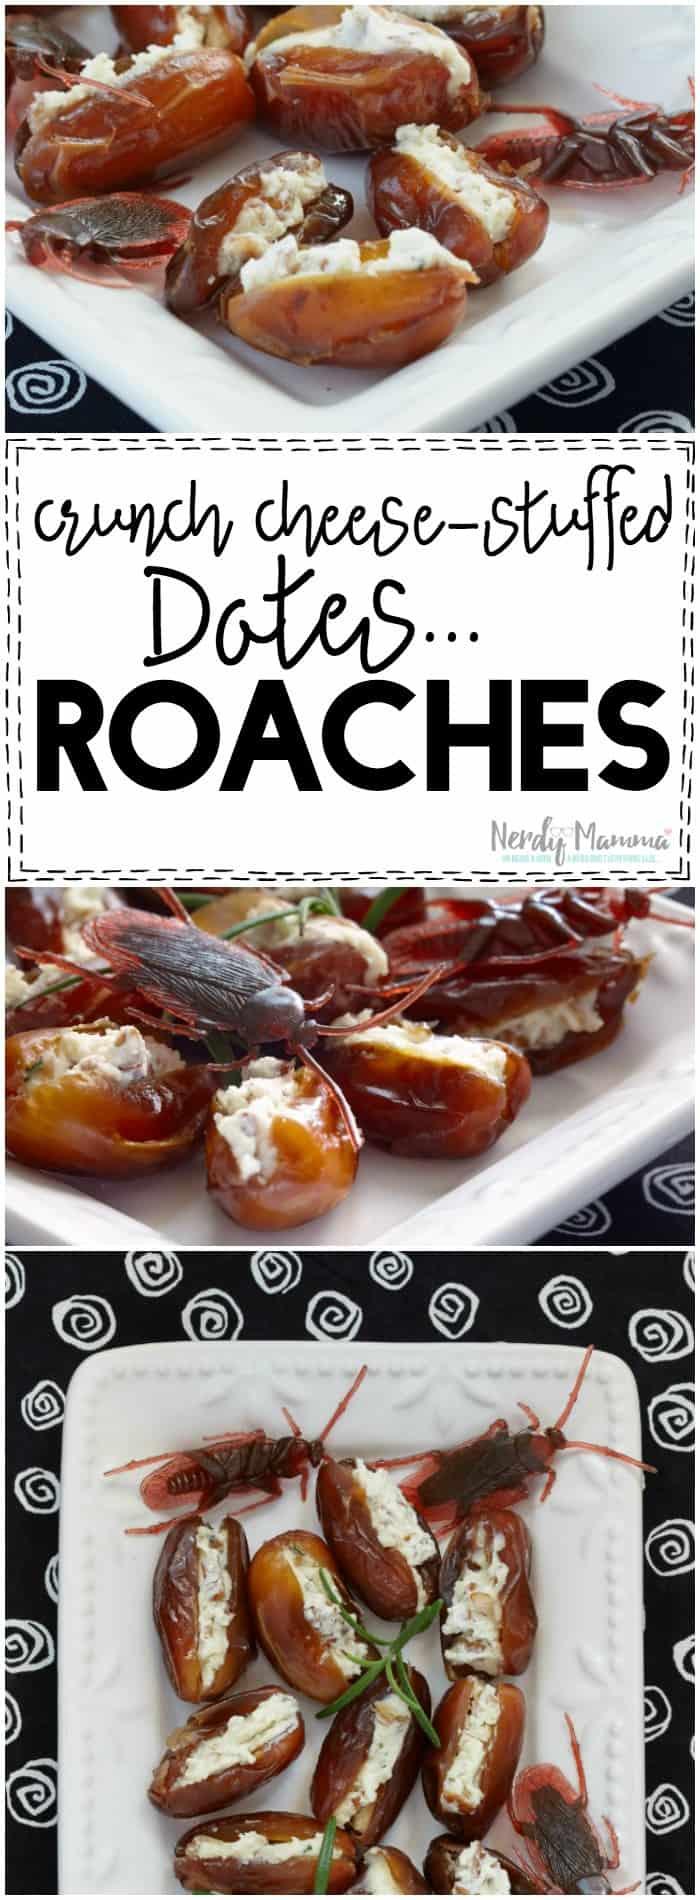 OMG! These are such a great gross food recipe idea...I love it. But eeeewwww! LOL!